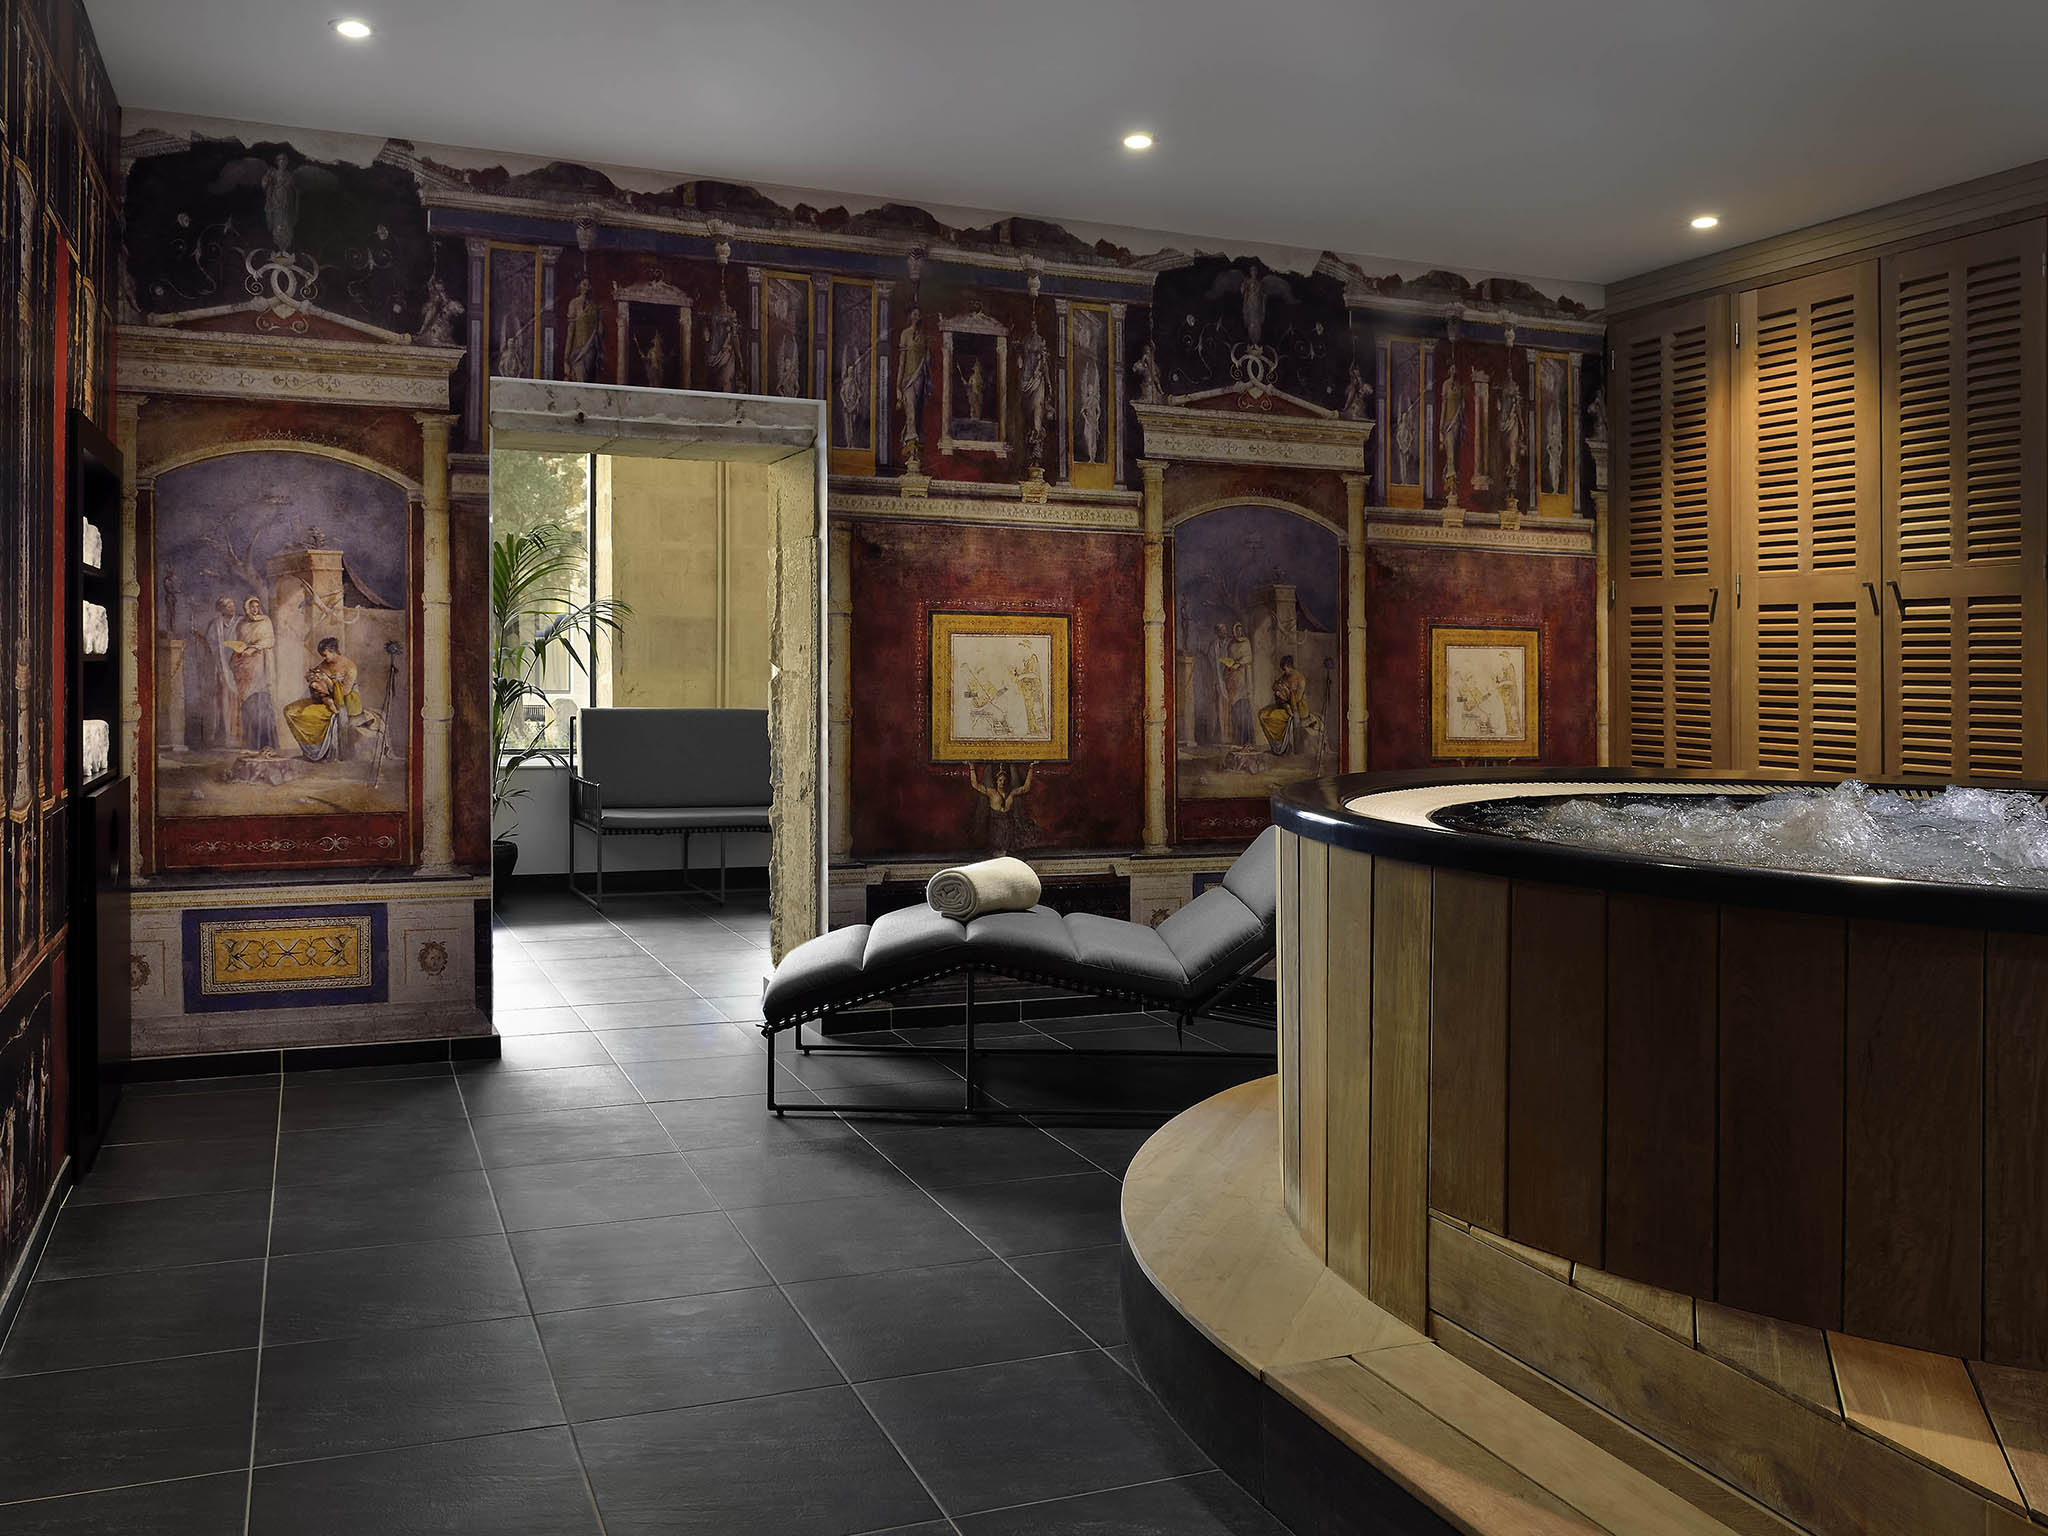 Hotel - Hôtel & Spa Jules César Arles - MGallery by Sofitel